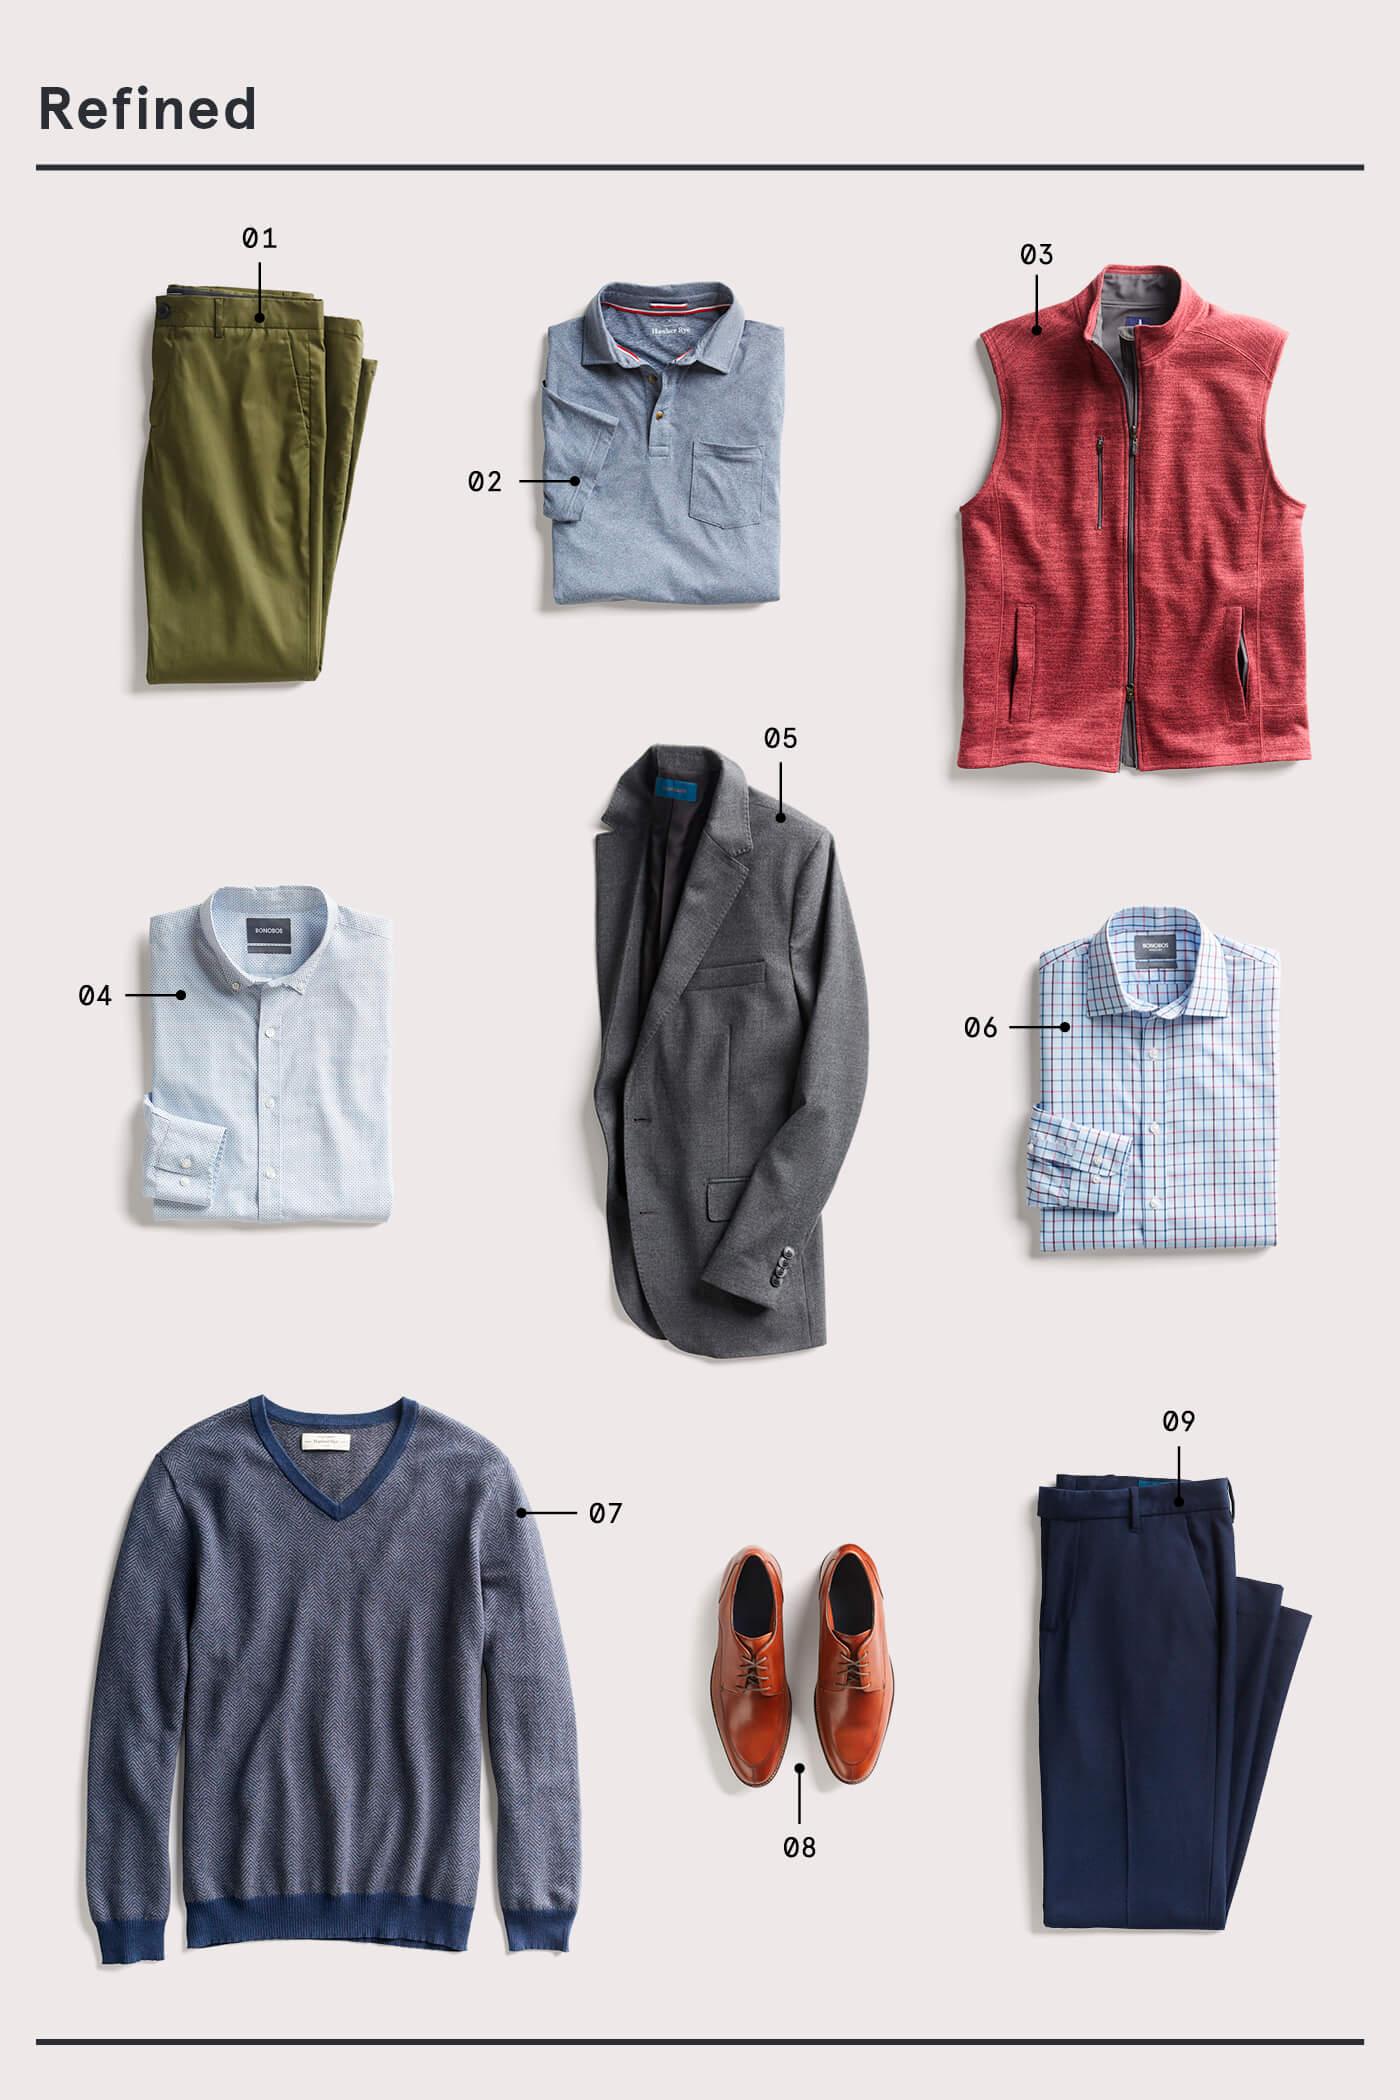 men's refined style essentials